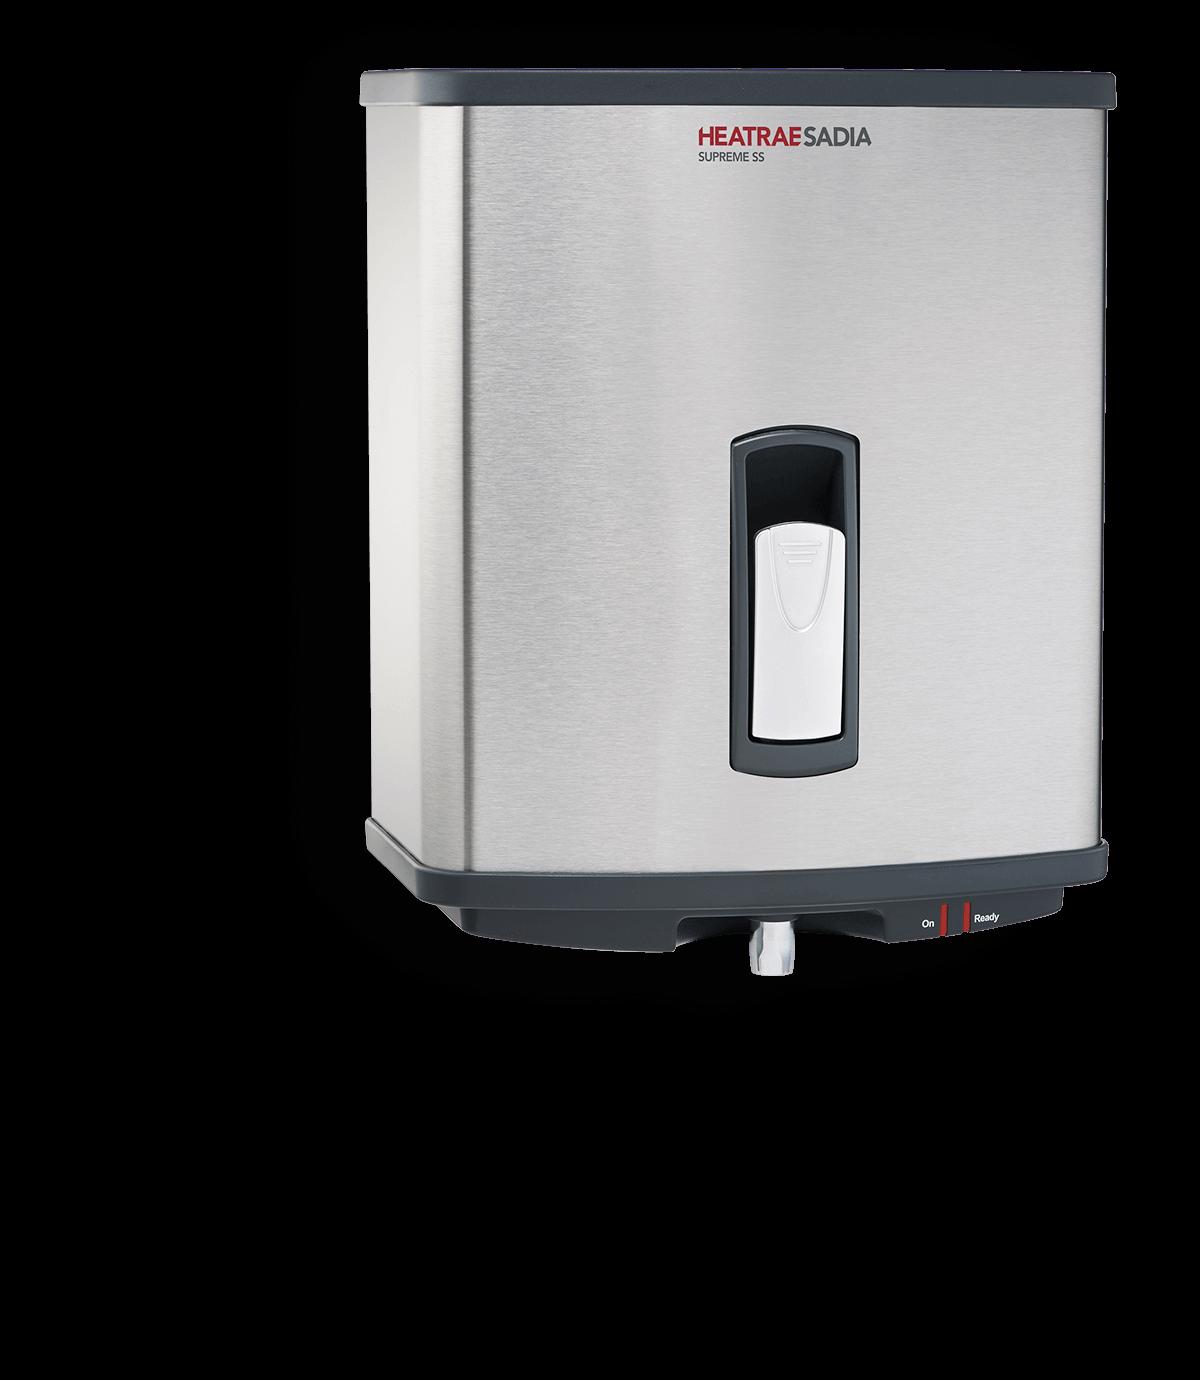 Supreme 150 | 165 | 180 - Wall-mounted boiler unit